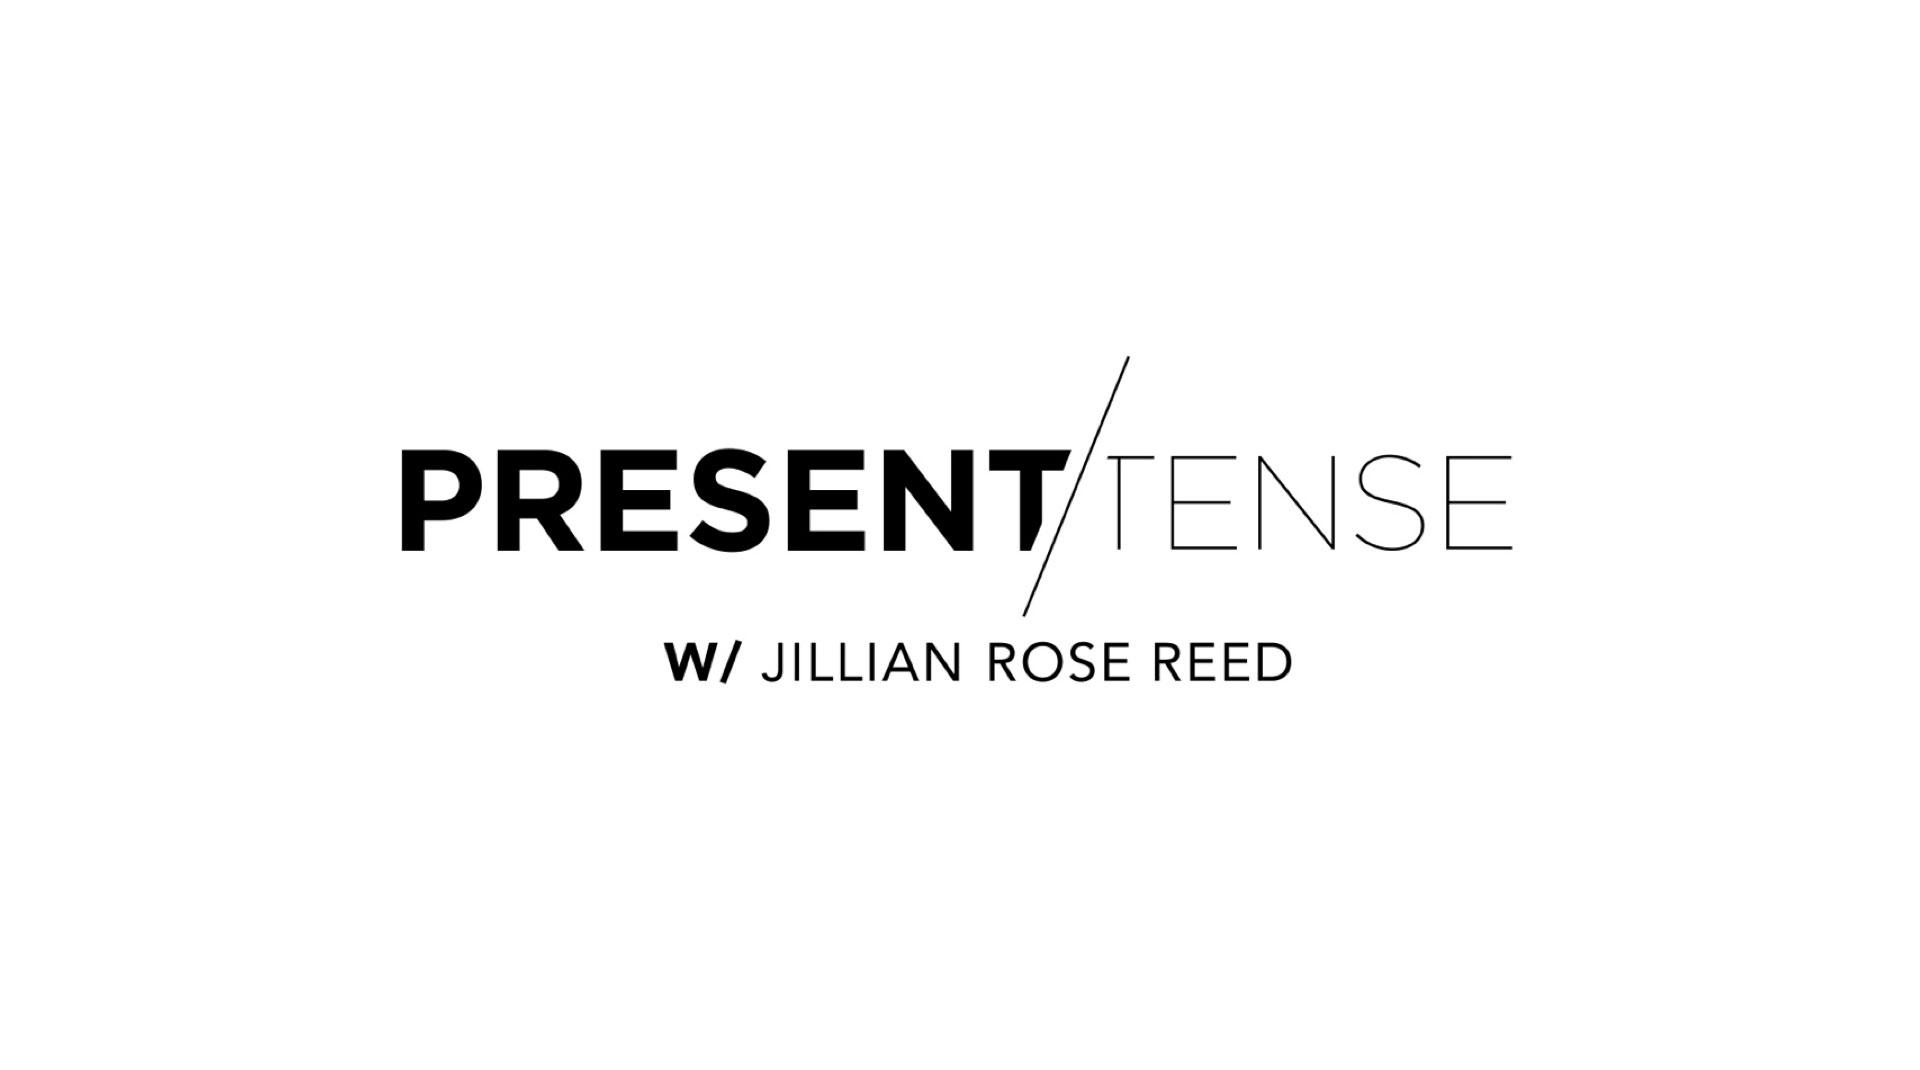 Present Tense with Jillian Rose Reed